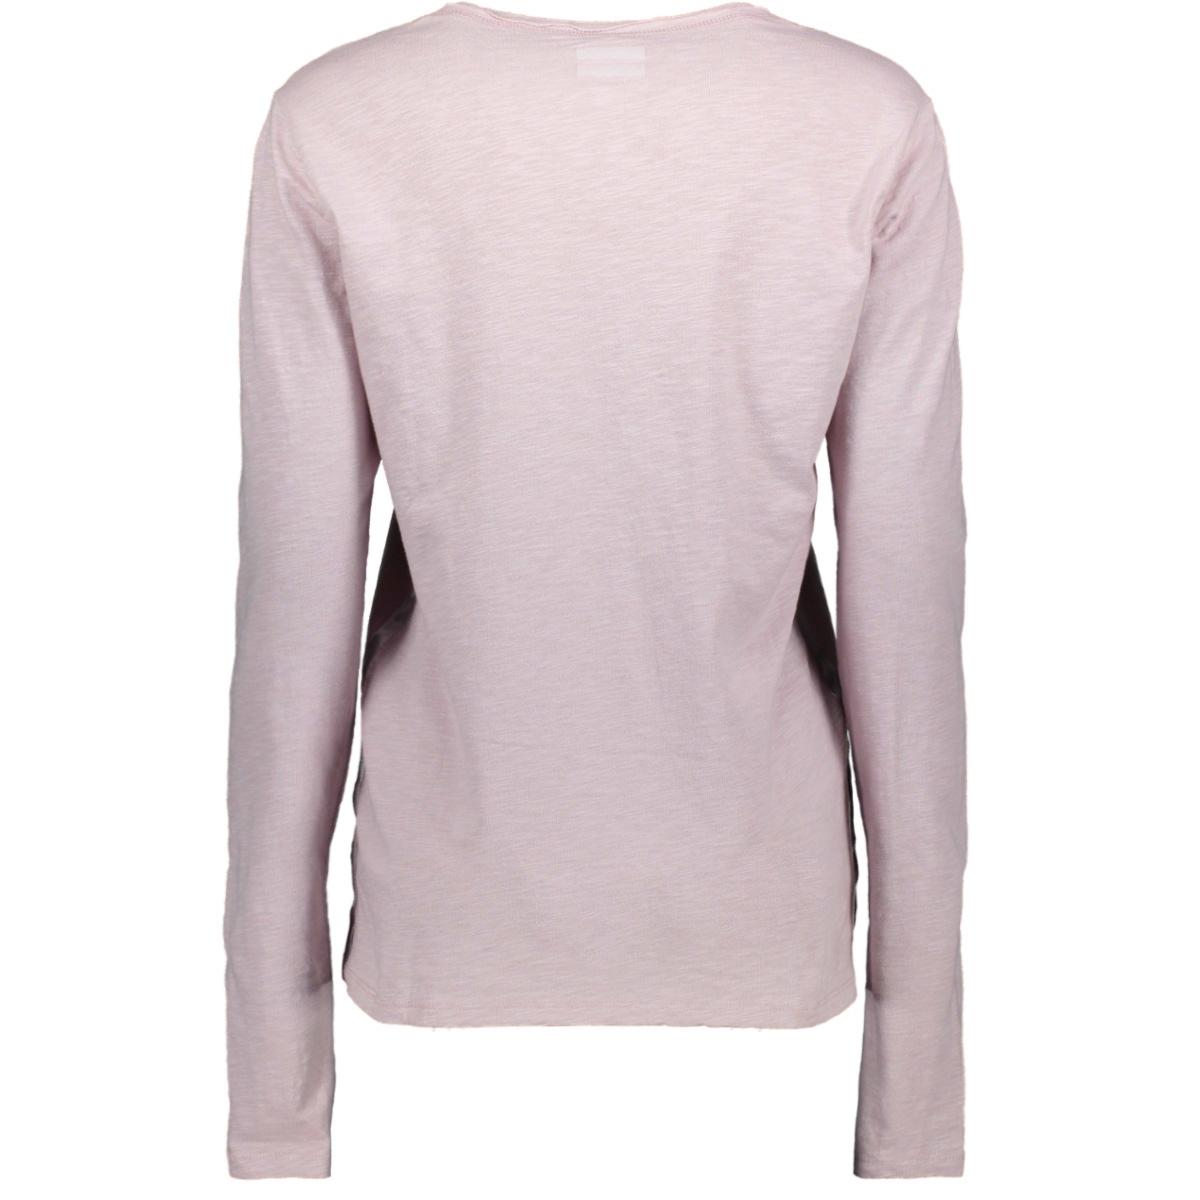 longsleeve tee slub 20 783 0201 10 days t-shirt zinc